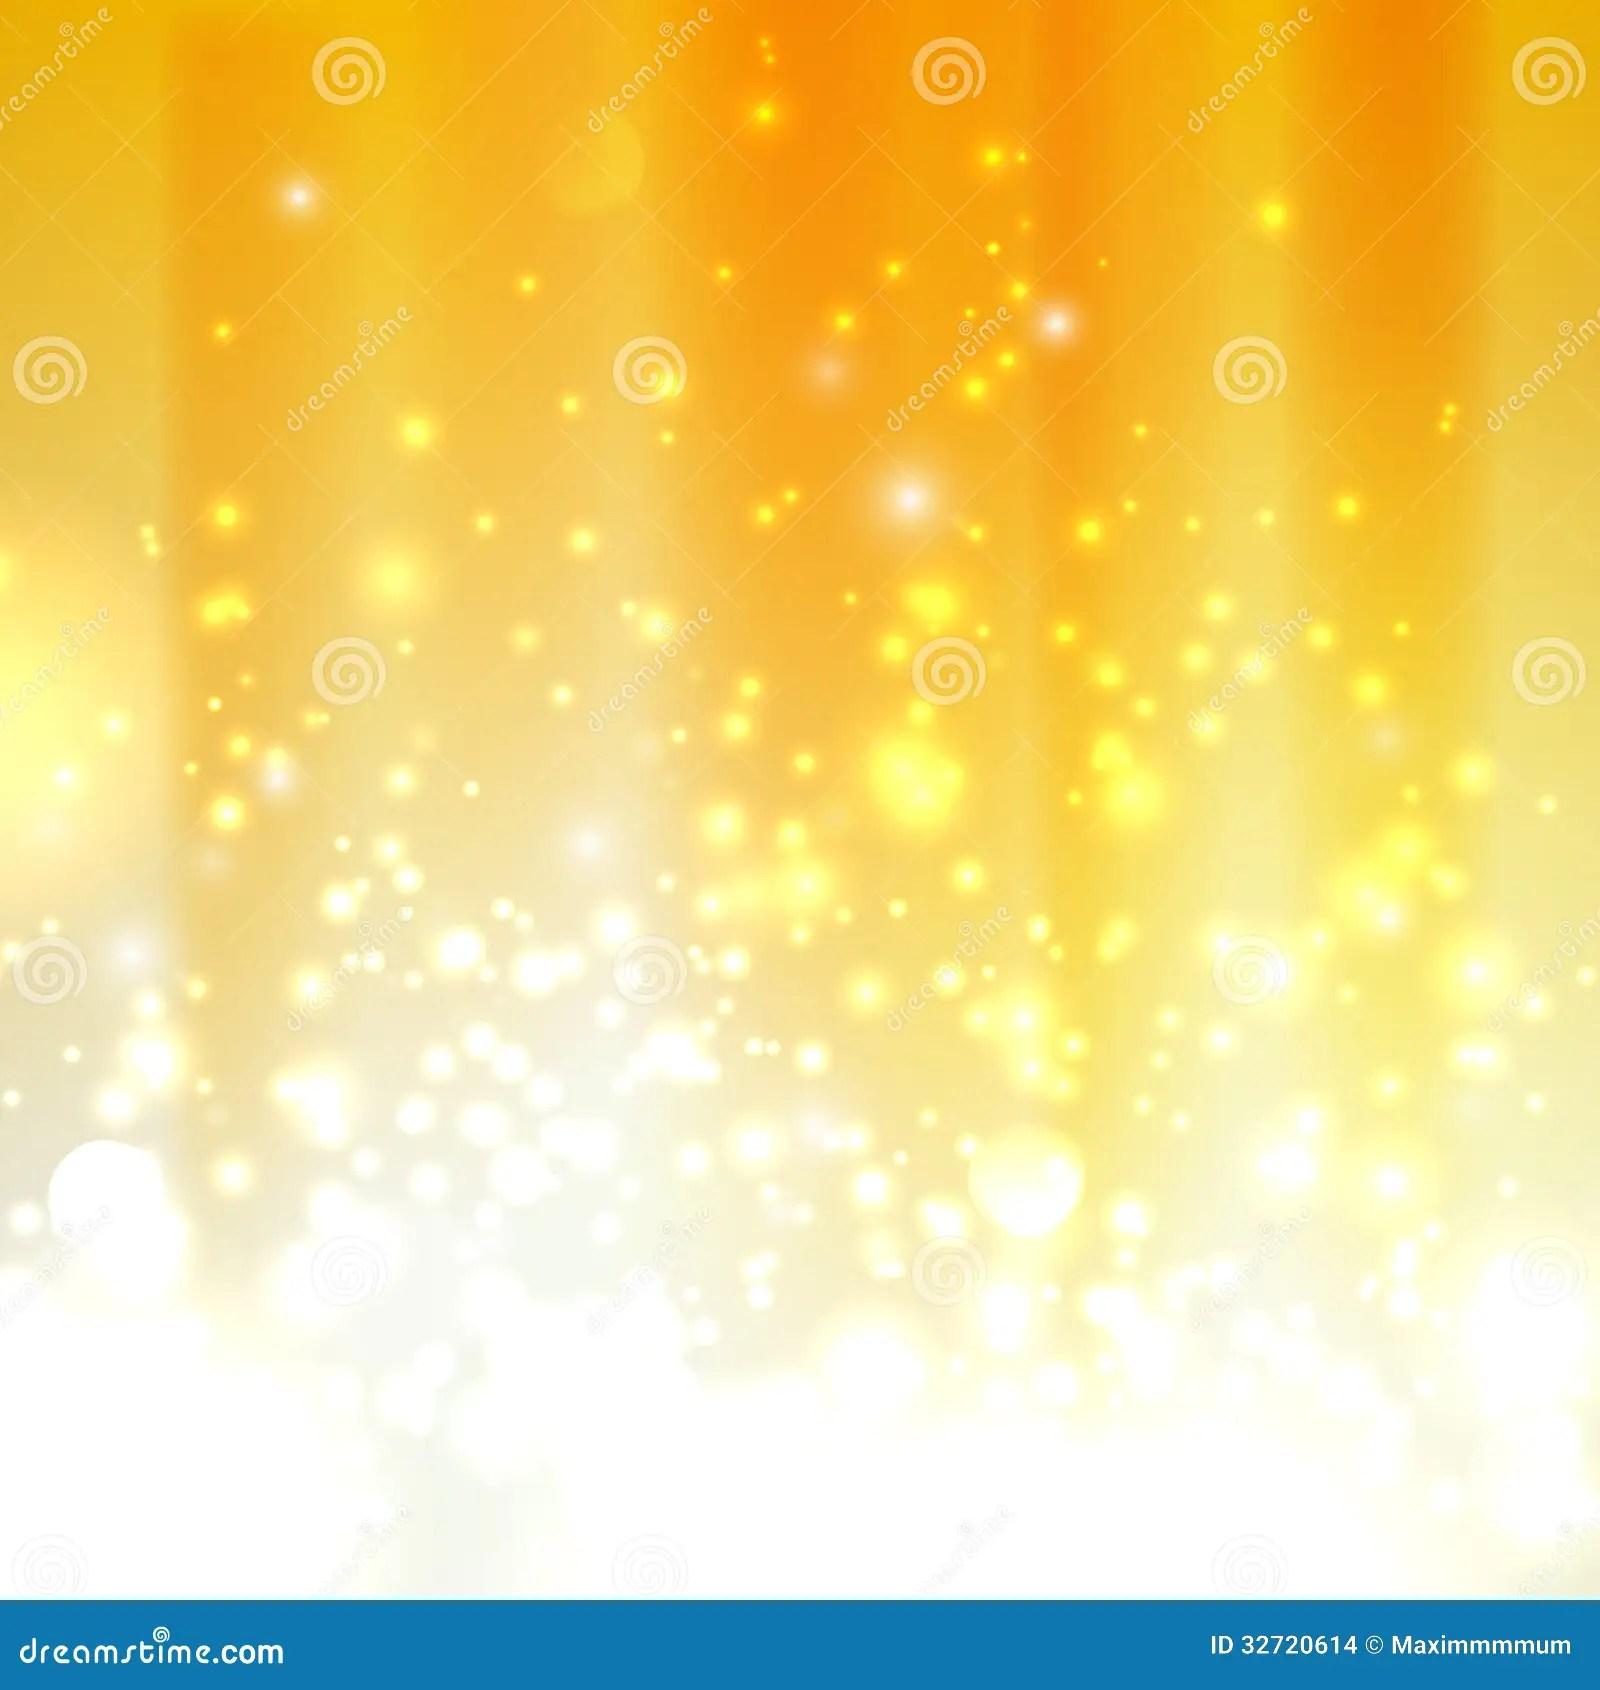 Light Effect Hd Wallpaper Orange Background With Sparkles Stock Illustration Image